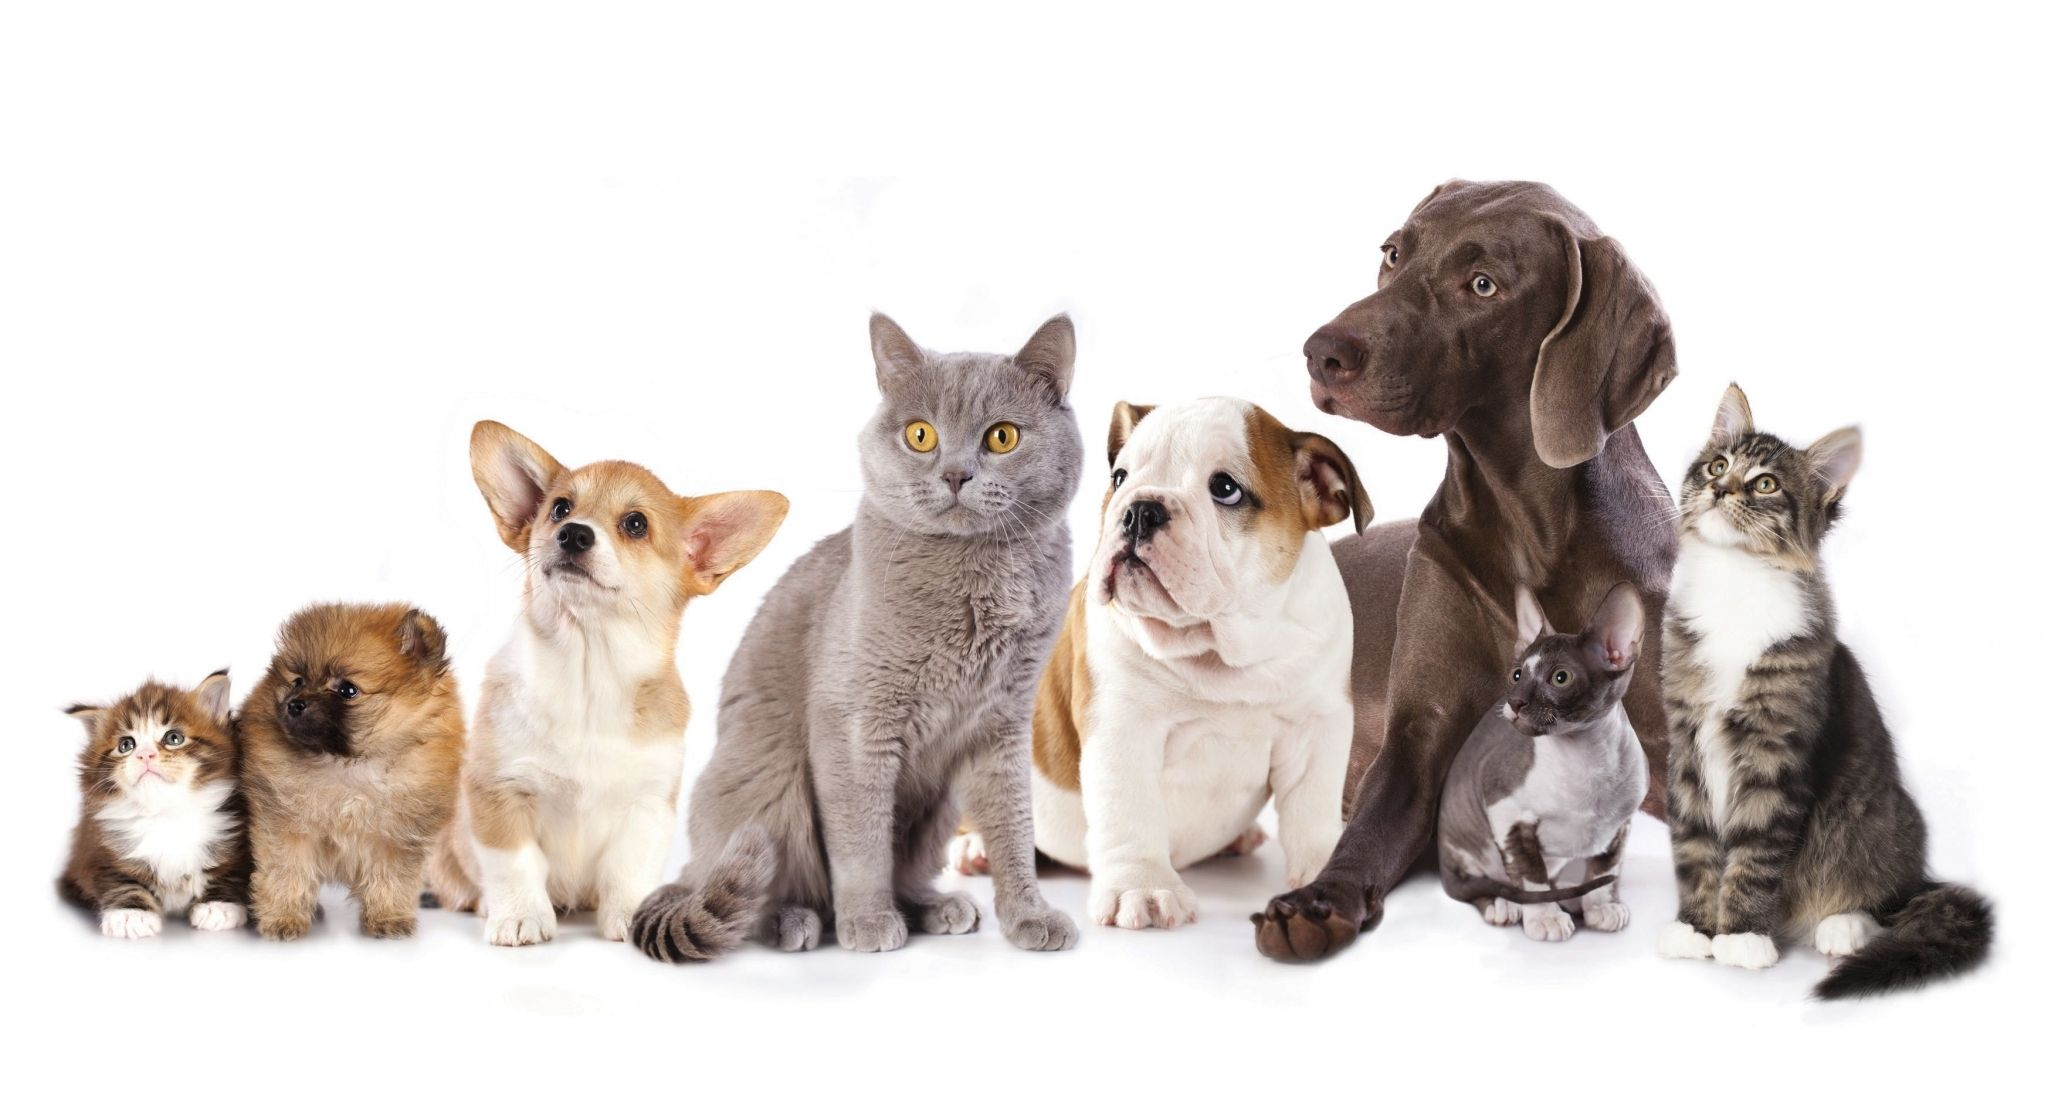 Dog Wallpaper Hd Backgrounds Images Dog Poster Pet Holiday Pet Market